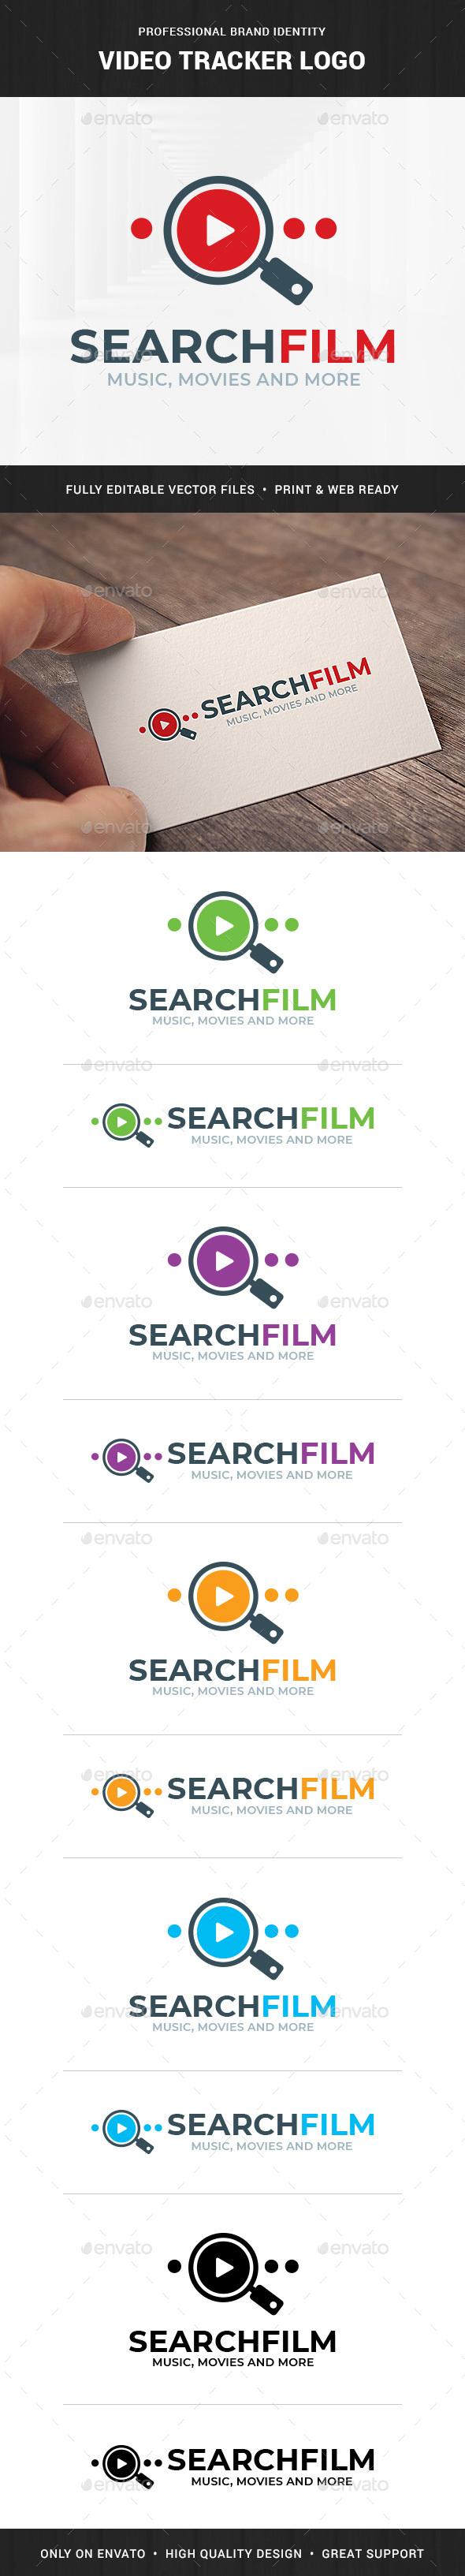 Video Tracker Logo Template